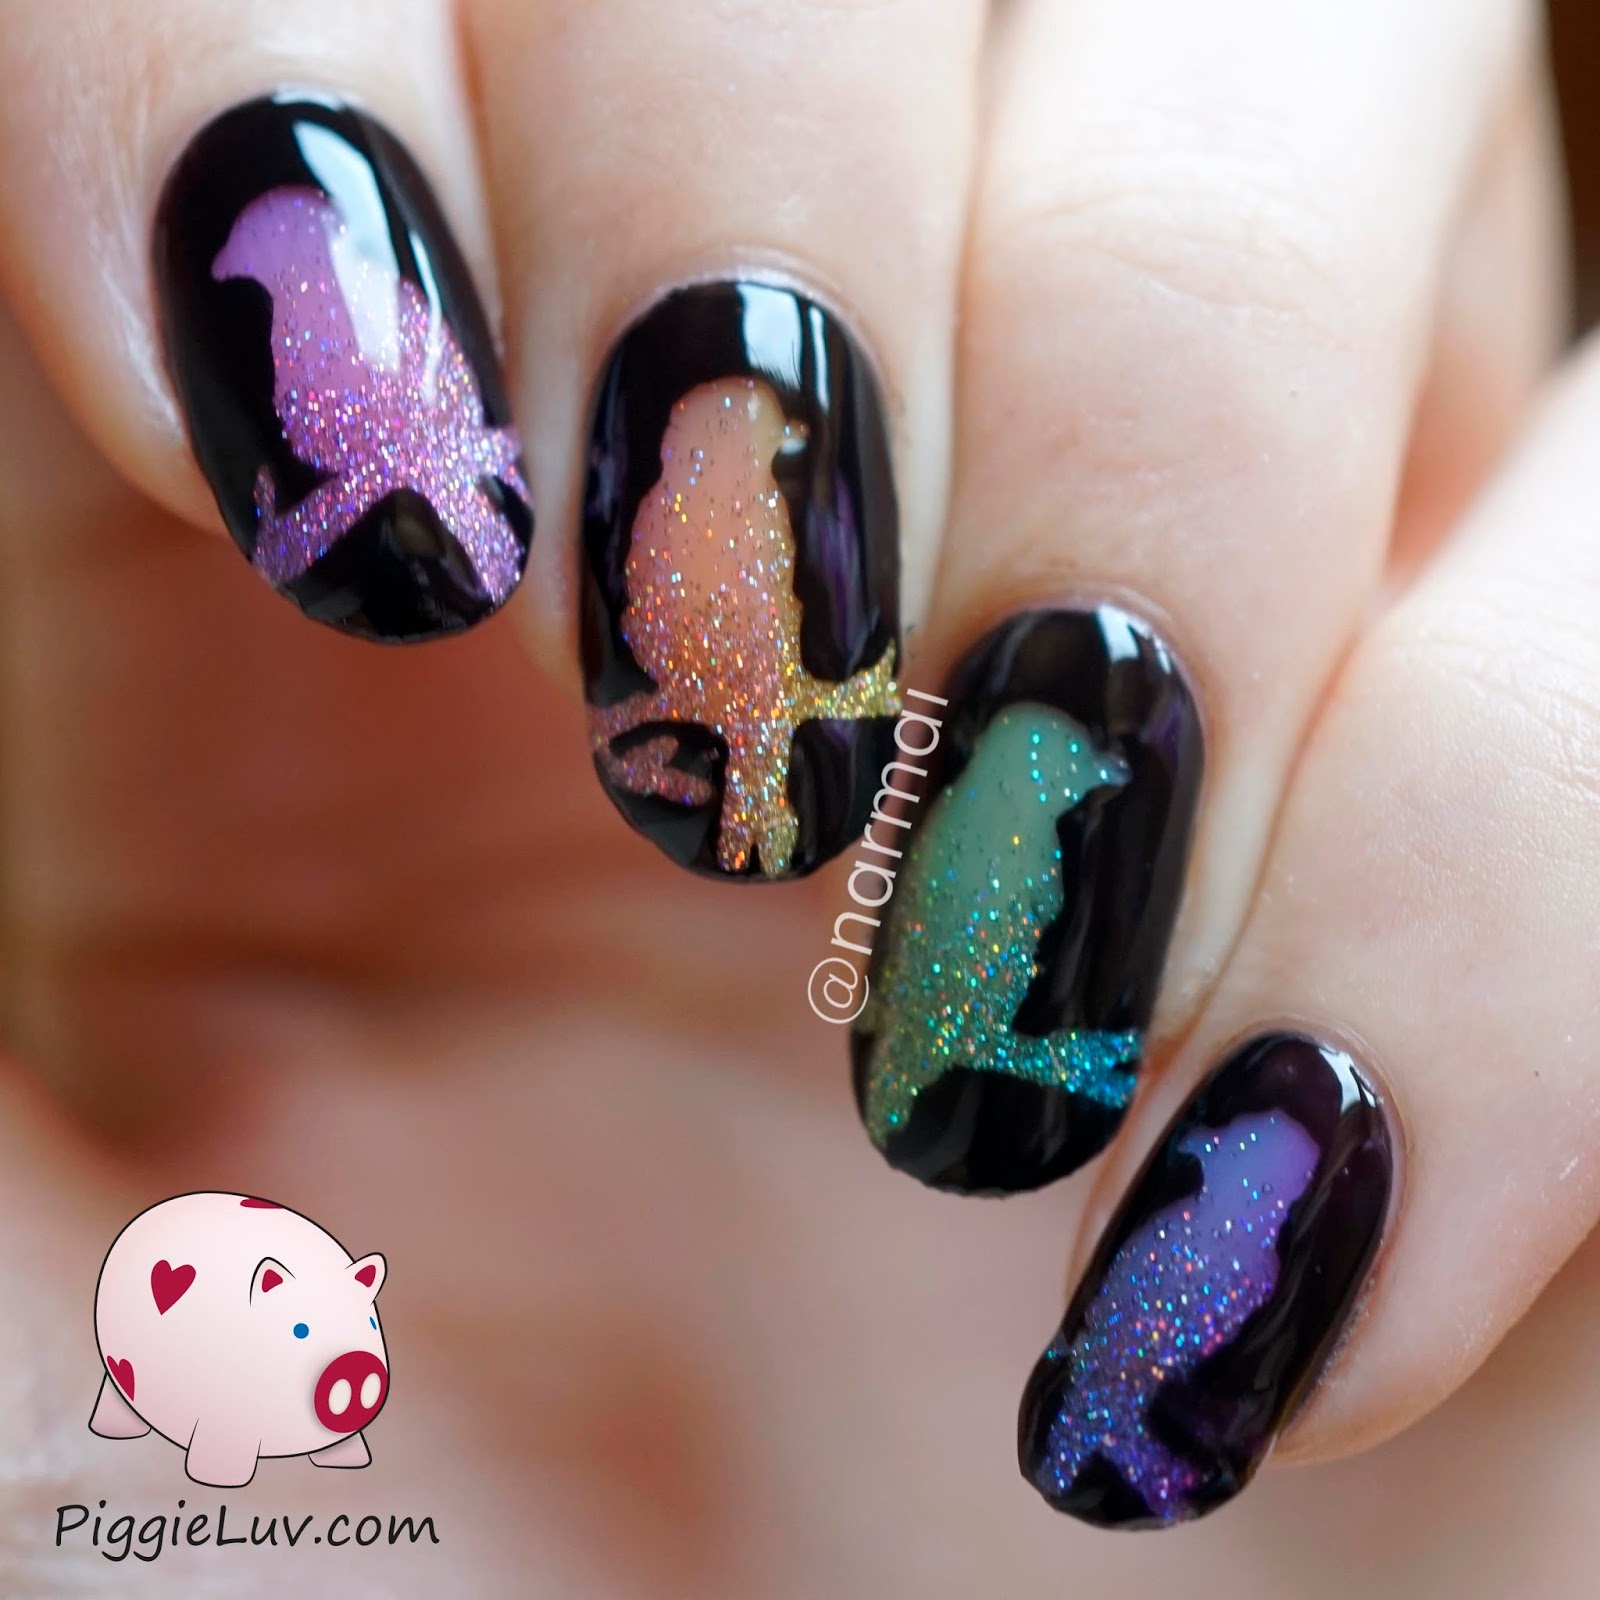 Glitter Nail Art Designs: PiggieLuv: Glitter Rainbow Birds Nail Art